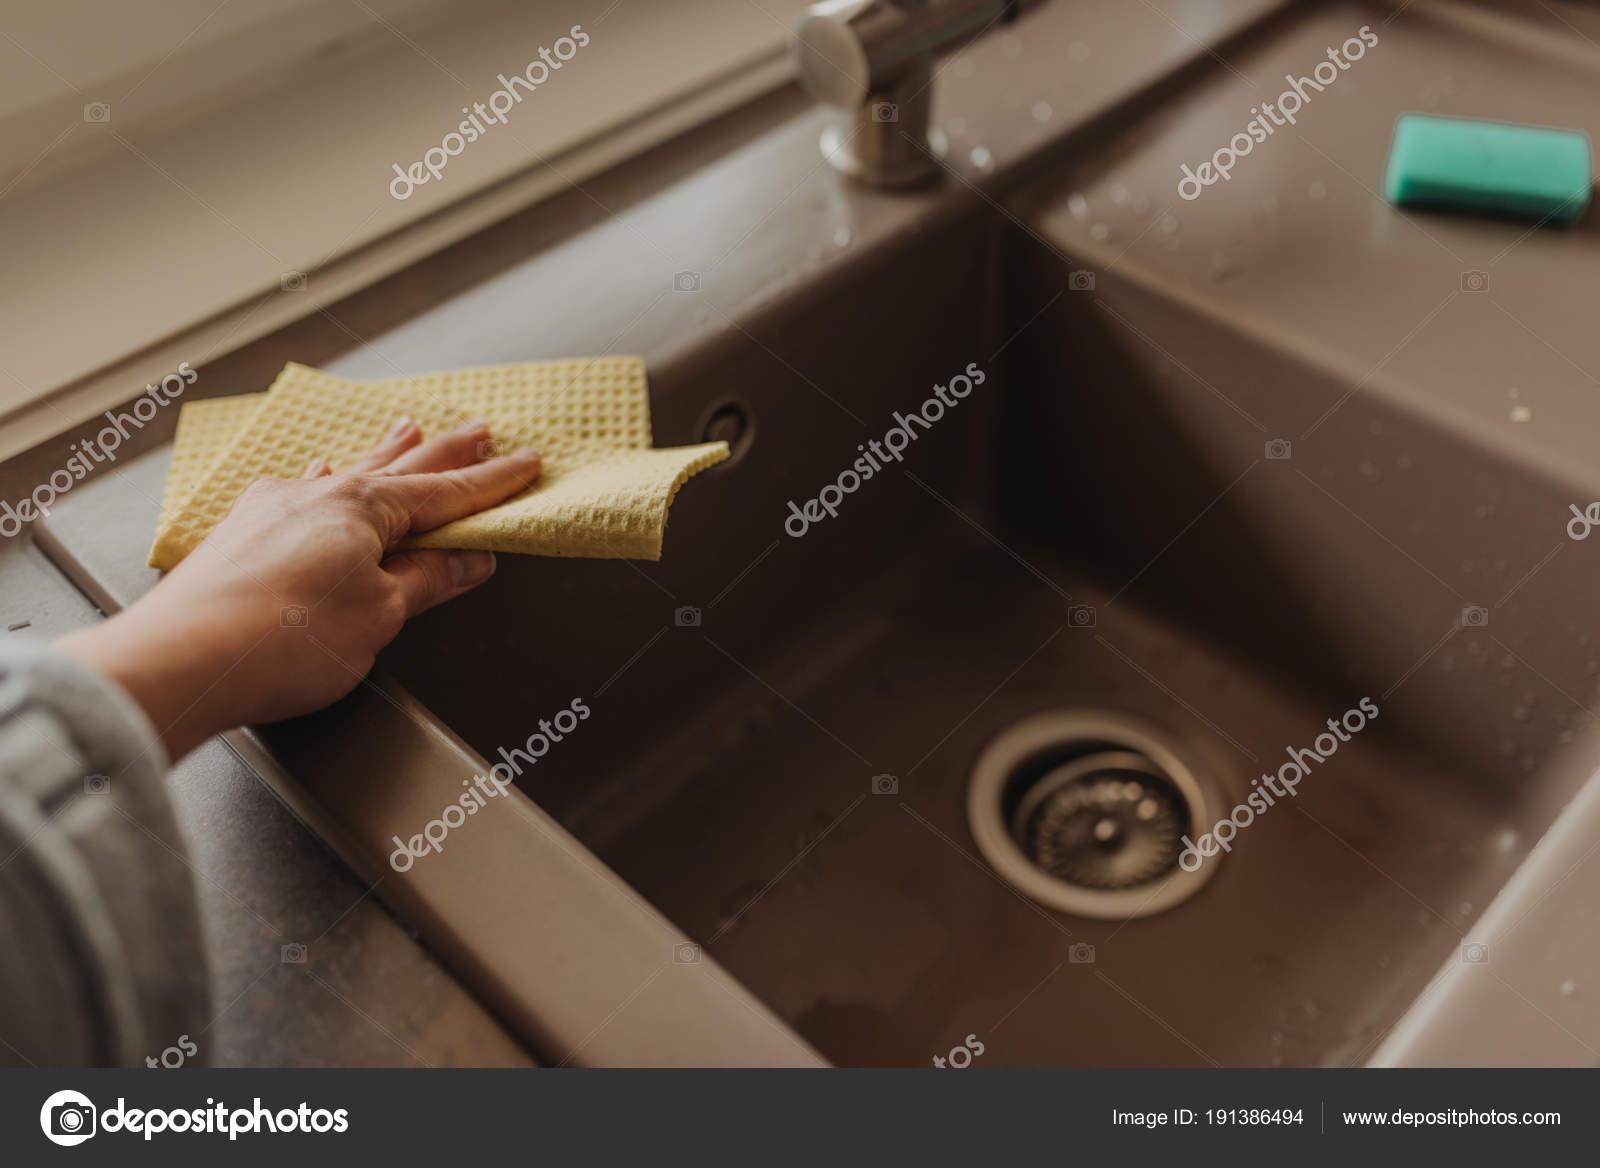 ceramic kitchen sink black appliances 关闭女性手擦拭棕色陶瓷厨房水槽与 图库照片 c smanyuk 191386494